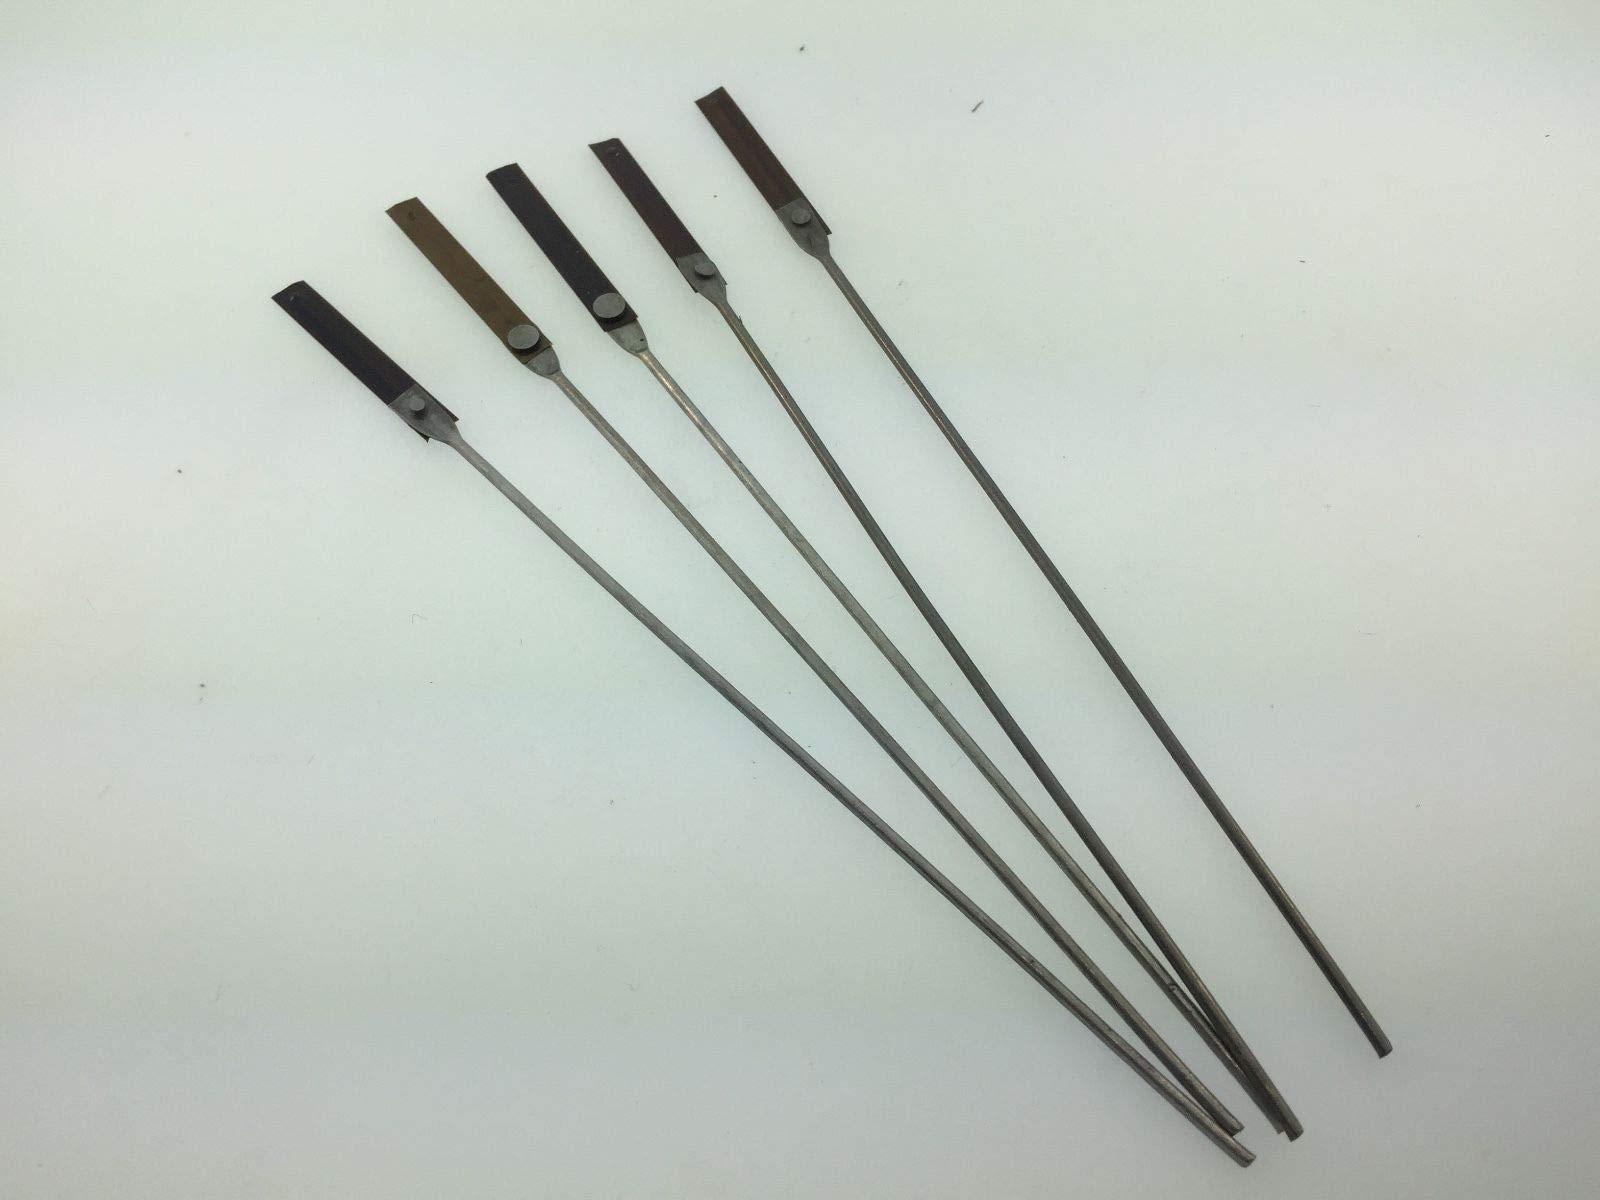 Antique Vintage Clock Suspension Springs Rod Set of 12 Part Clock Repair by Suspension Springs (Image #1)